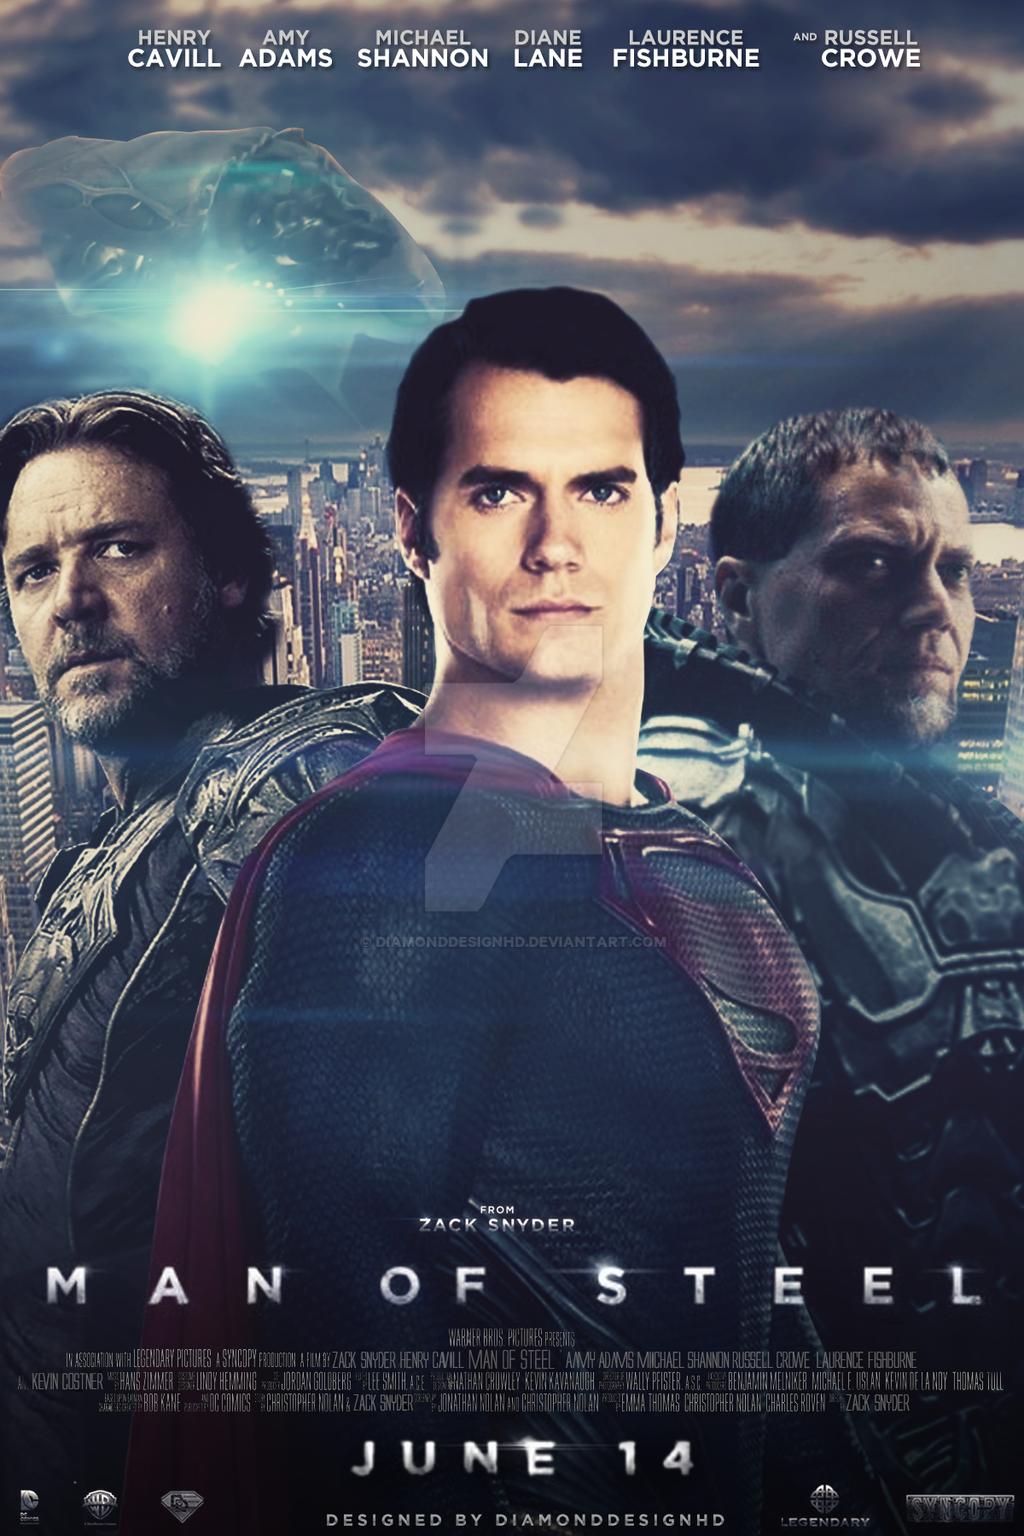 man of steel fan made poster design v9 by diamonddesignhd